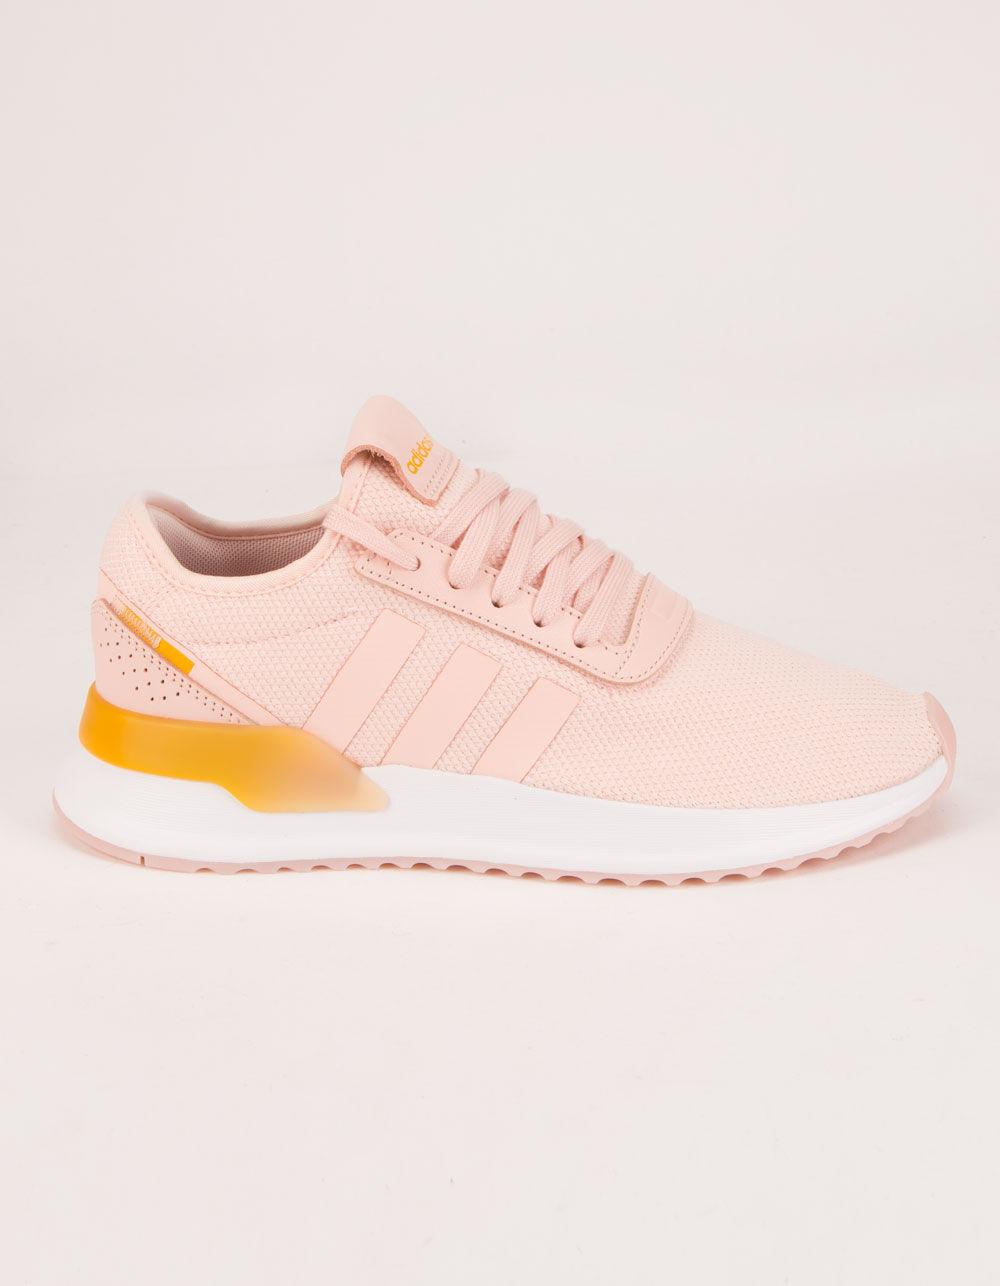 ADIDAS U_Path X Icey Pink & Cloud White Shoes